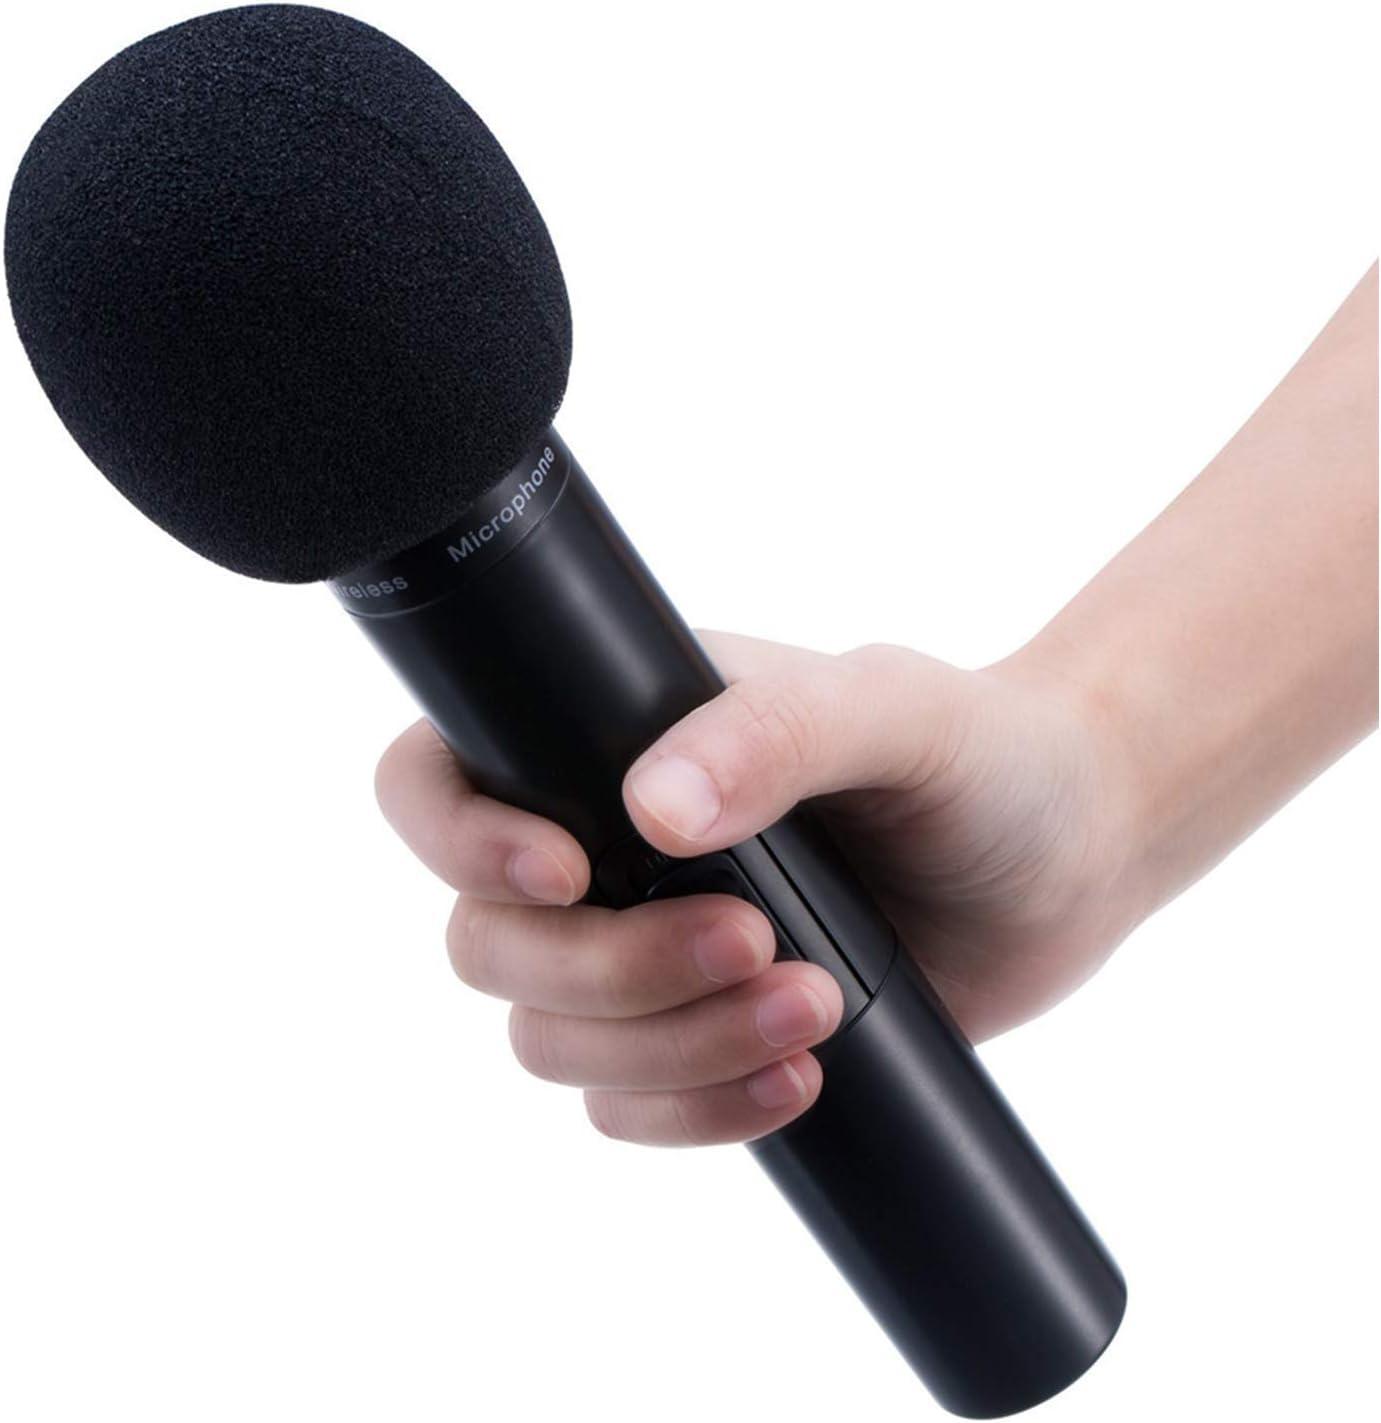 Micr/ófono engrosado 5 unids cubierta esponja micr/ófono cubierta hogar KTV micr/ófono esponja cubierta Blowout cubierta a prueba de viento esponja cubierta port/átil etapa micr/ófono viento cubierta